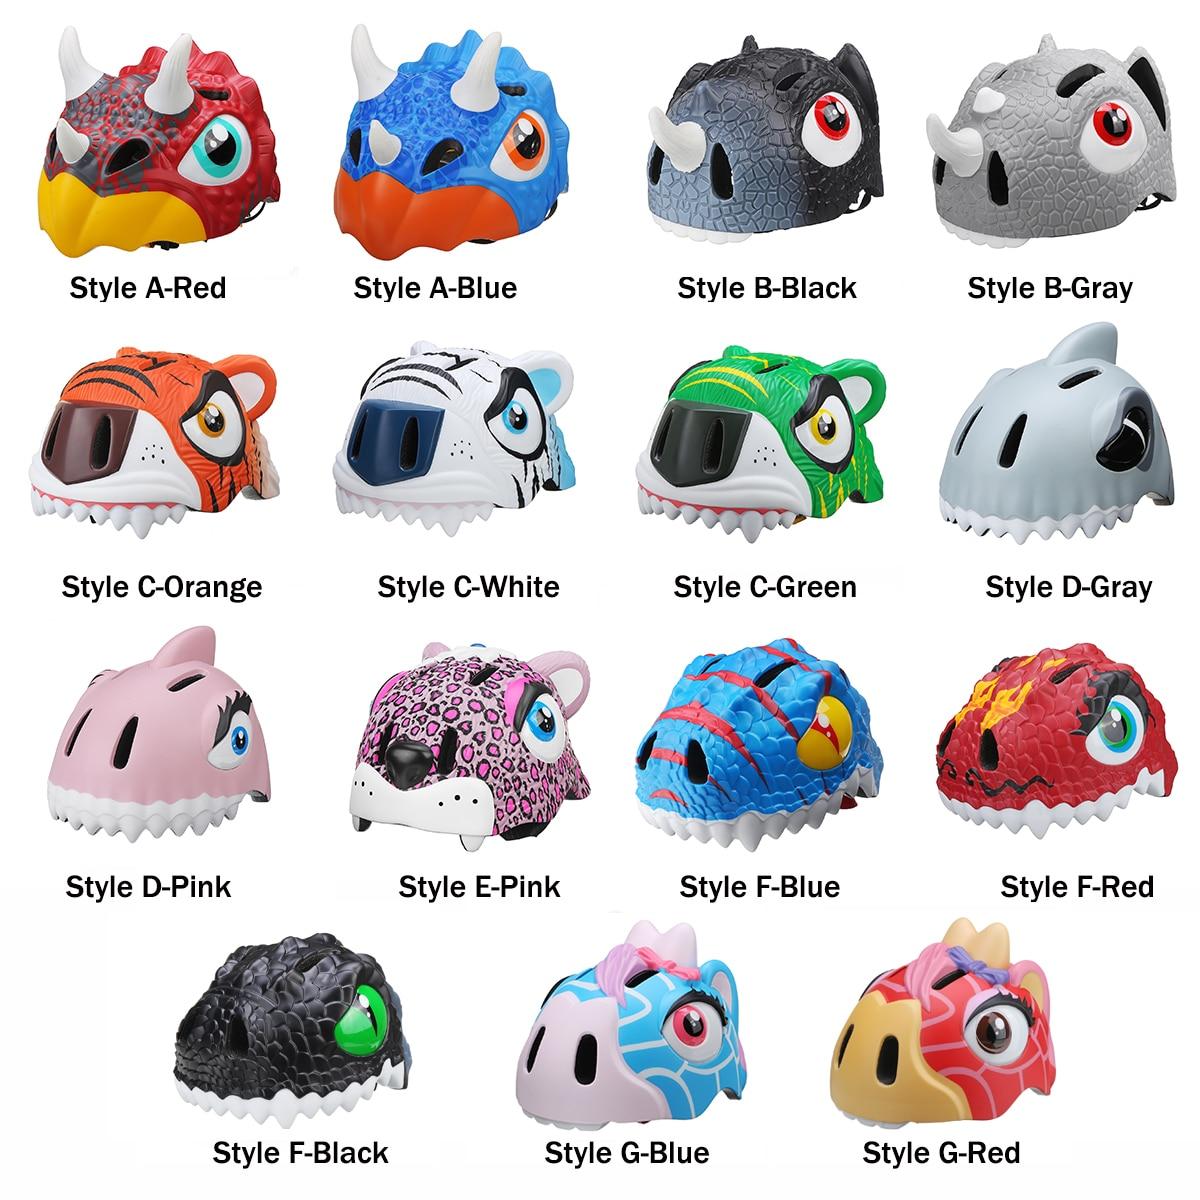 49-55cm Kid Light Helmet Skateboard Helmet Child Safety Animal Helmet Bicycle Helmet Cycling Caps Bicycle защитный детский шлем